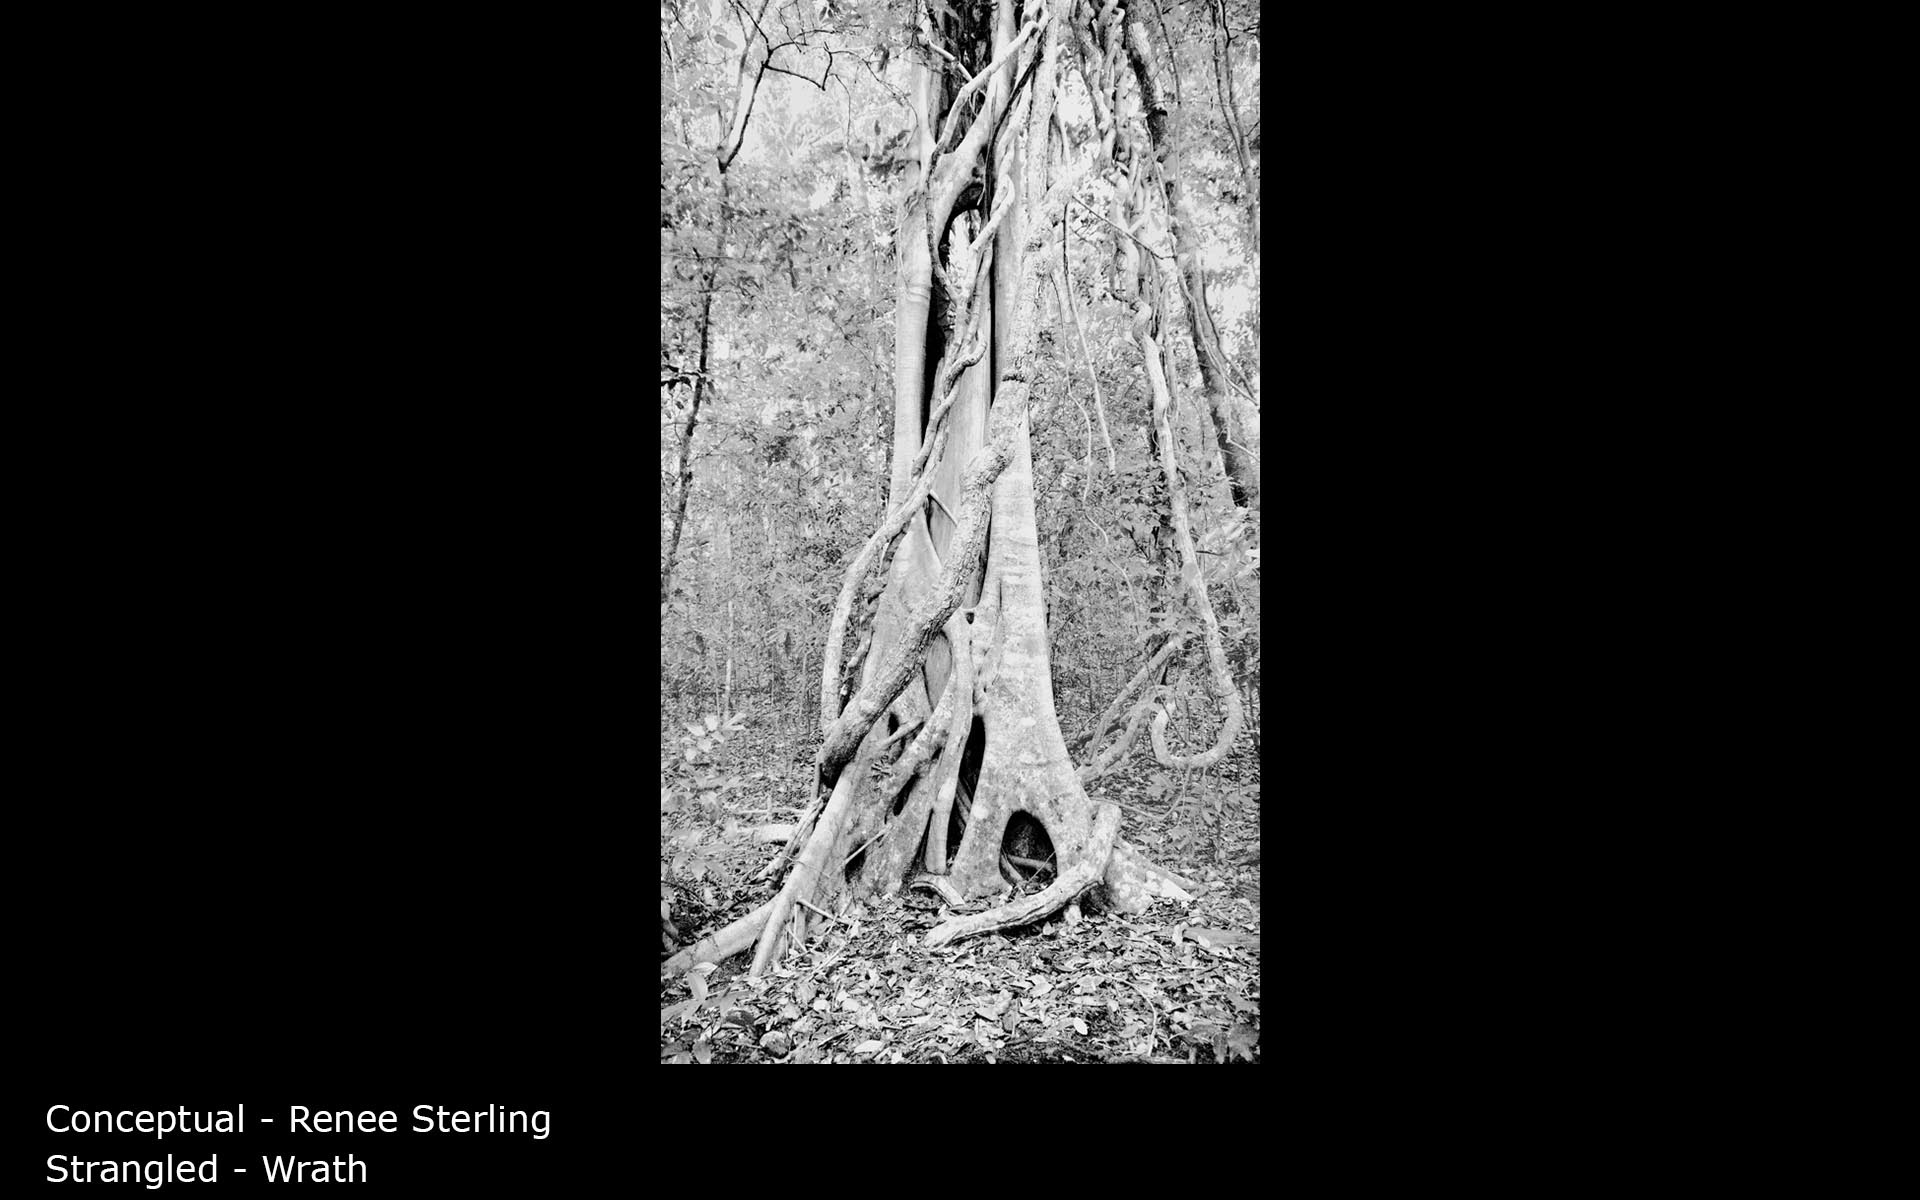 Strangled - Wrath - Renee Sterling